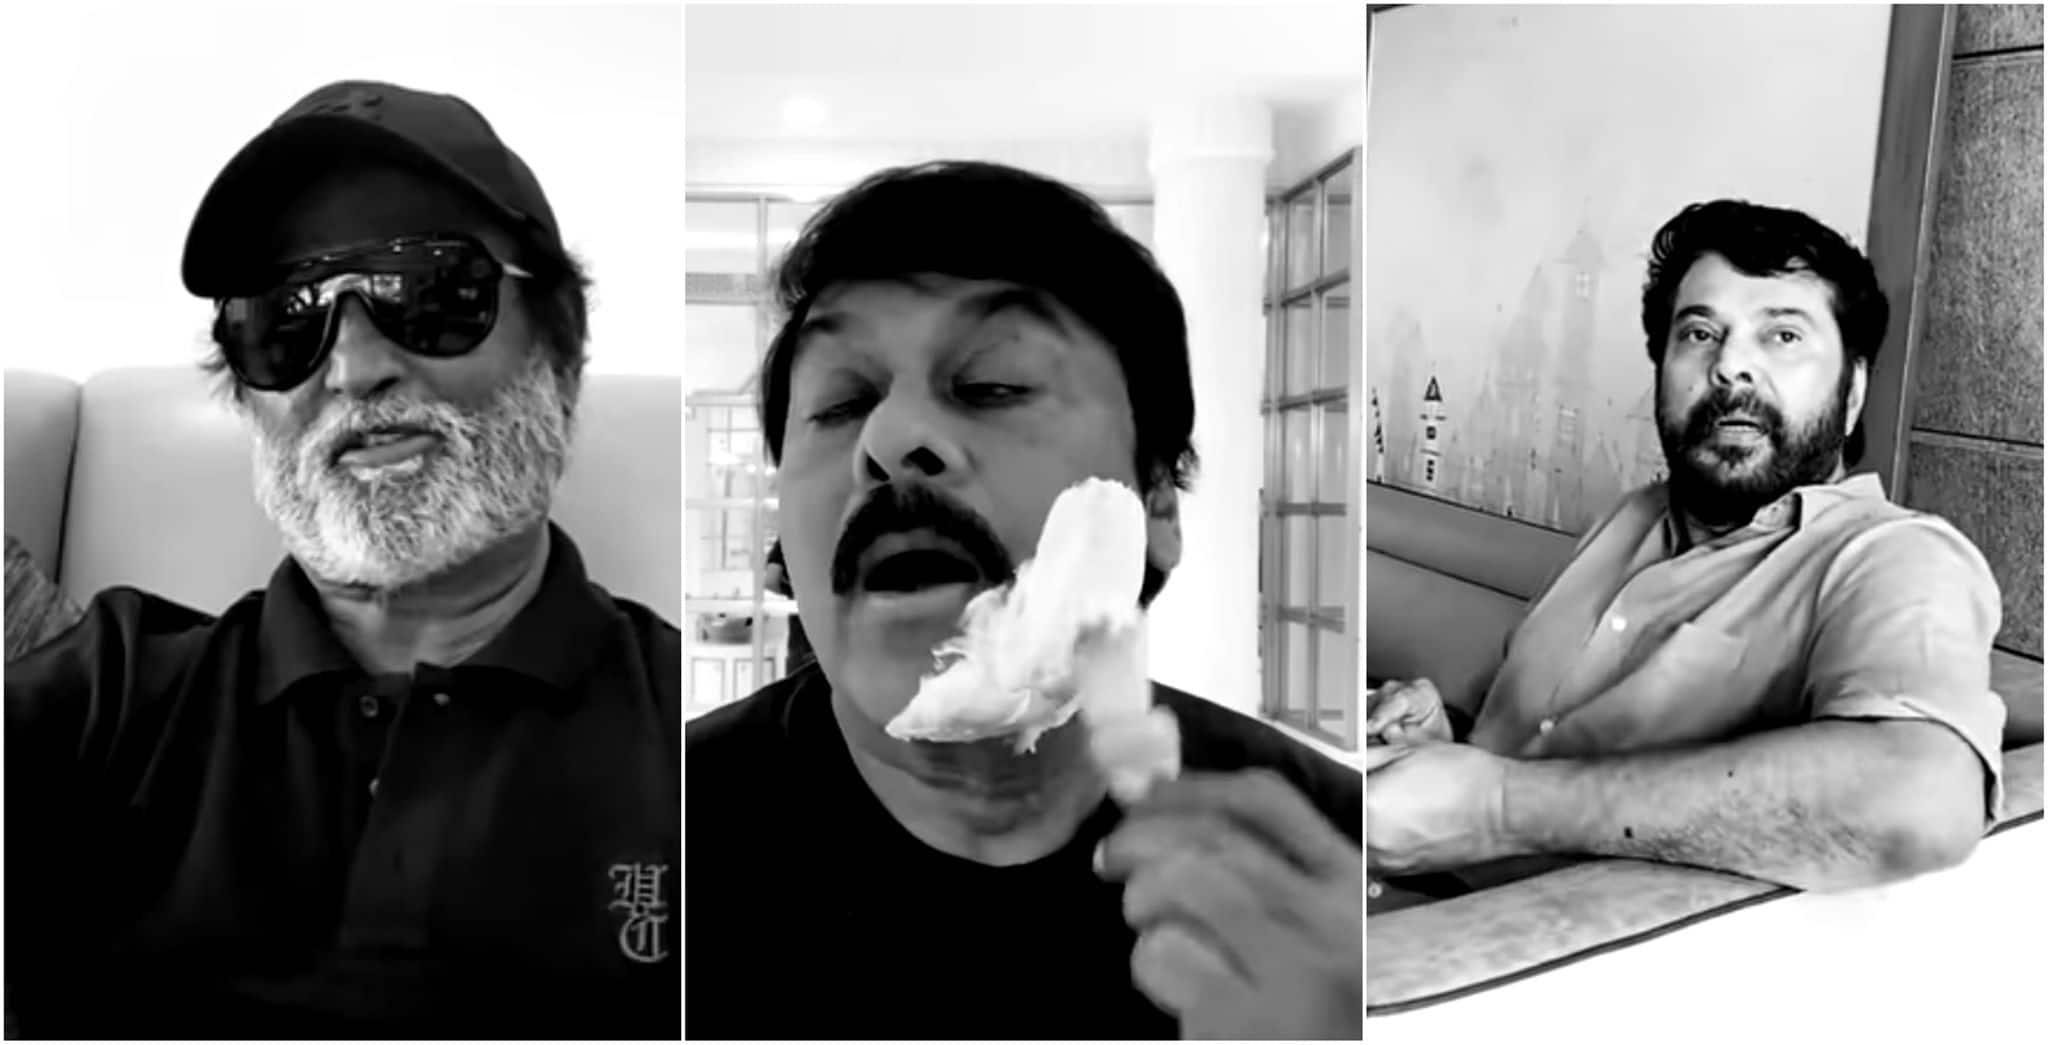 Family: Amitabh, Rajinikanth, Ranbir, Priyanka And Diljit's Made-At-Home Short Film Has A Very Interesting Message Regarding COVID-19; Watch